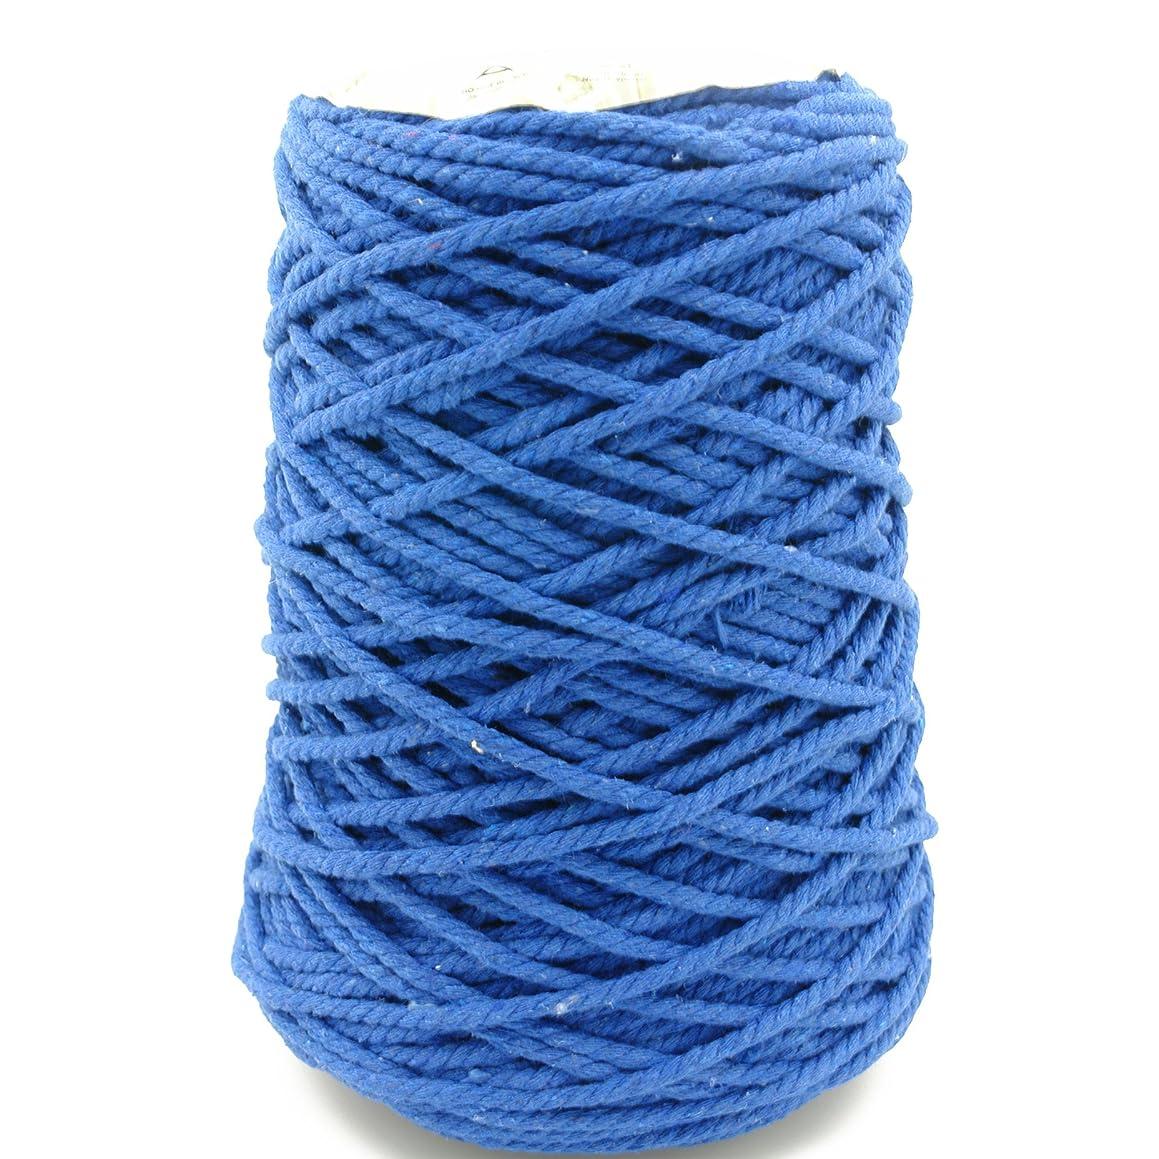 Charmkey Fashion Cotton Yarn 100% Soft Cotton 4 Medium Gauge for Crocheting and Knitting Projects DIY Crafts,17.6 Oz/500g (Mailbu Blue)